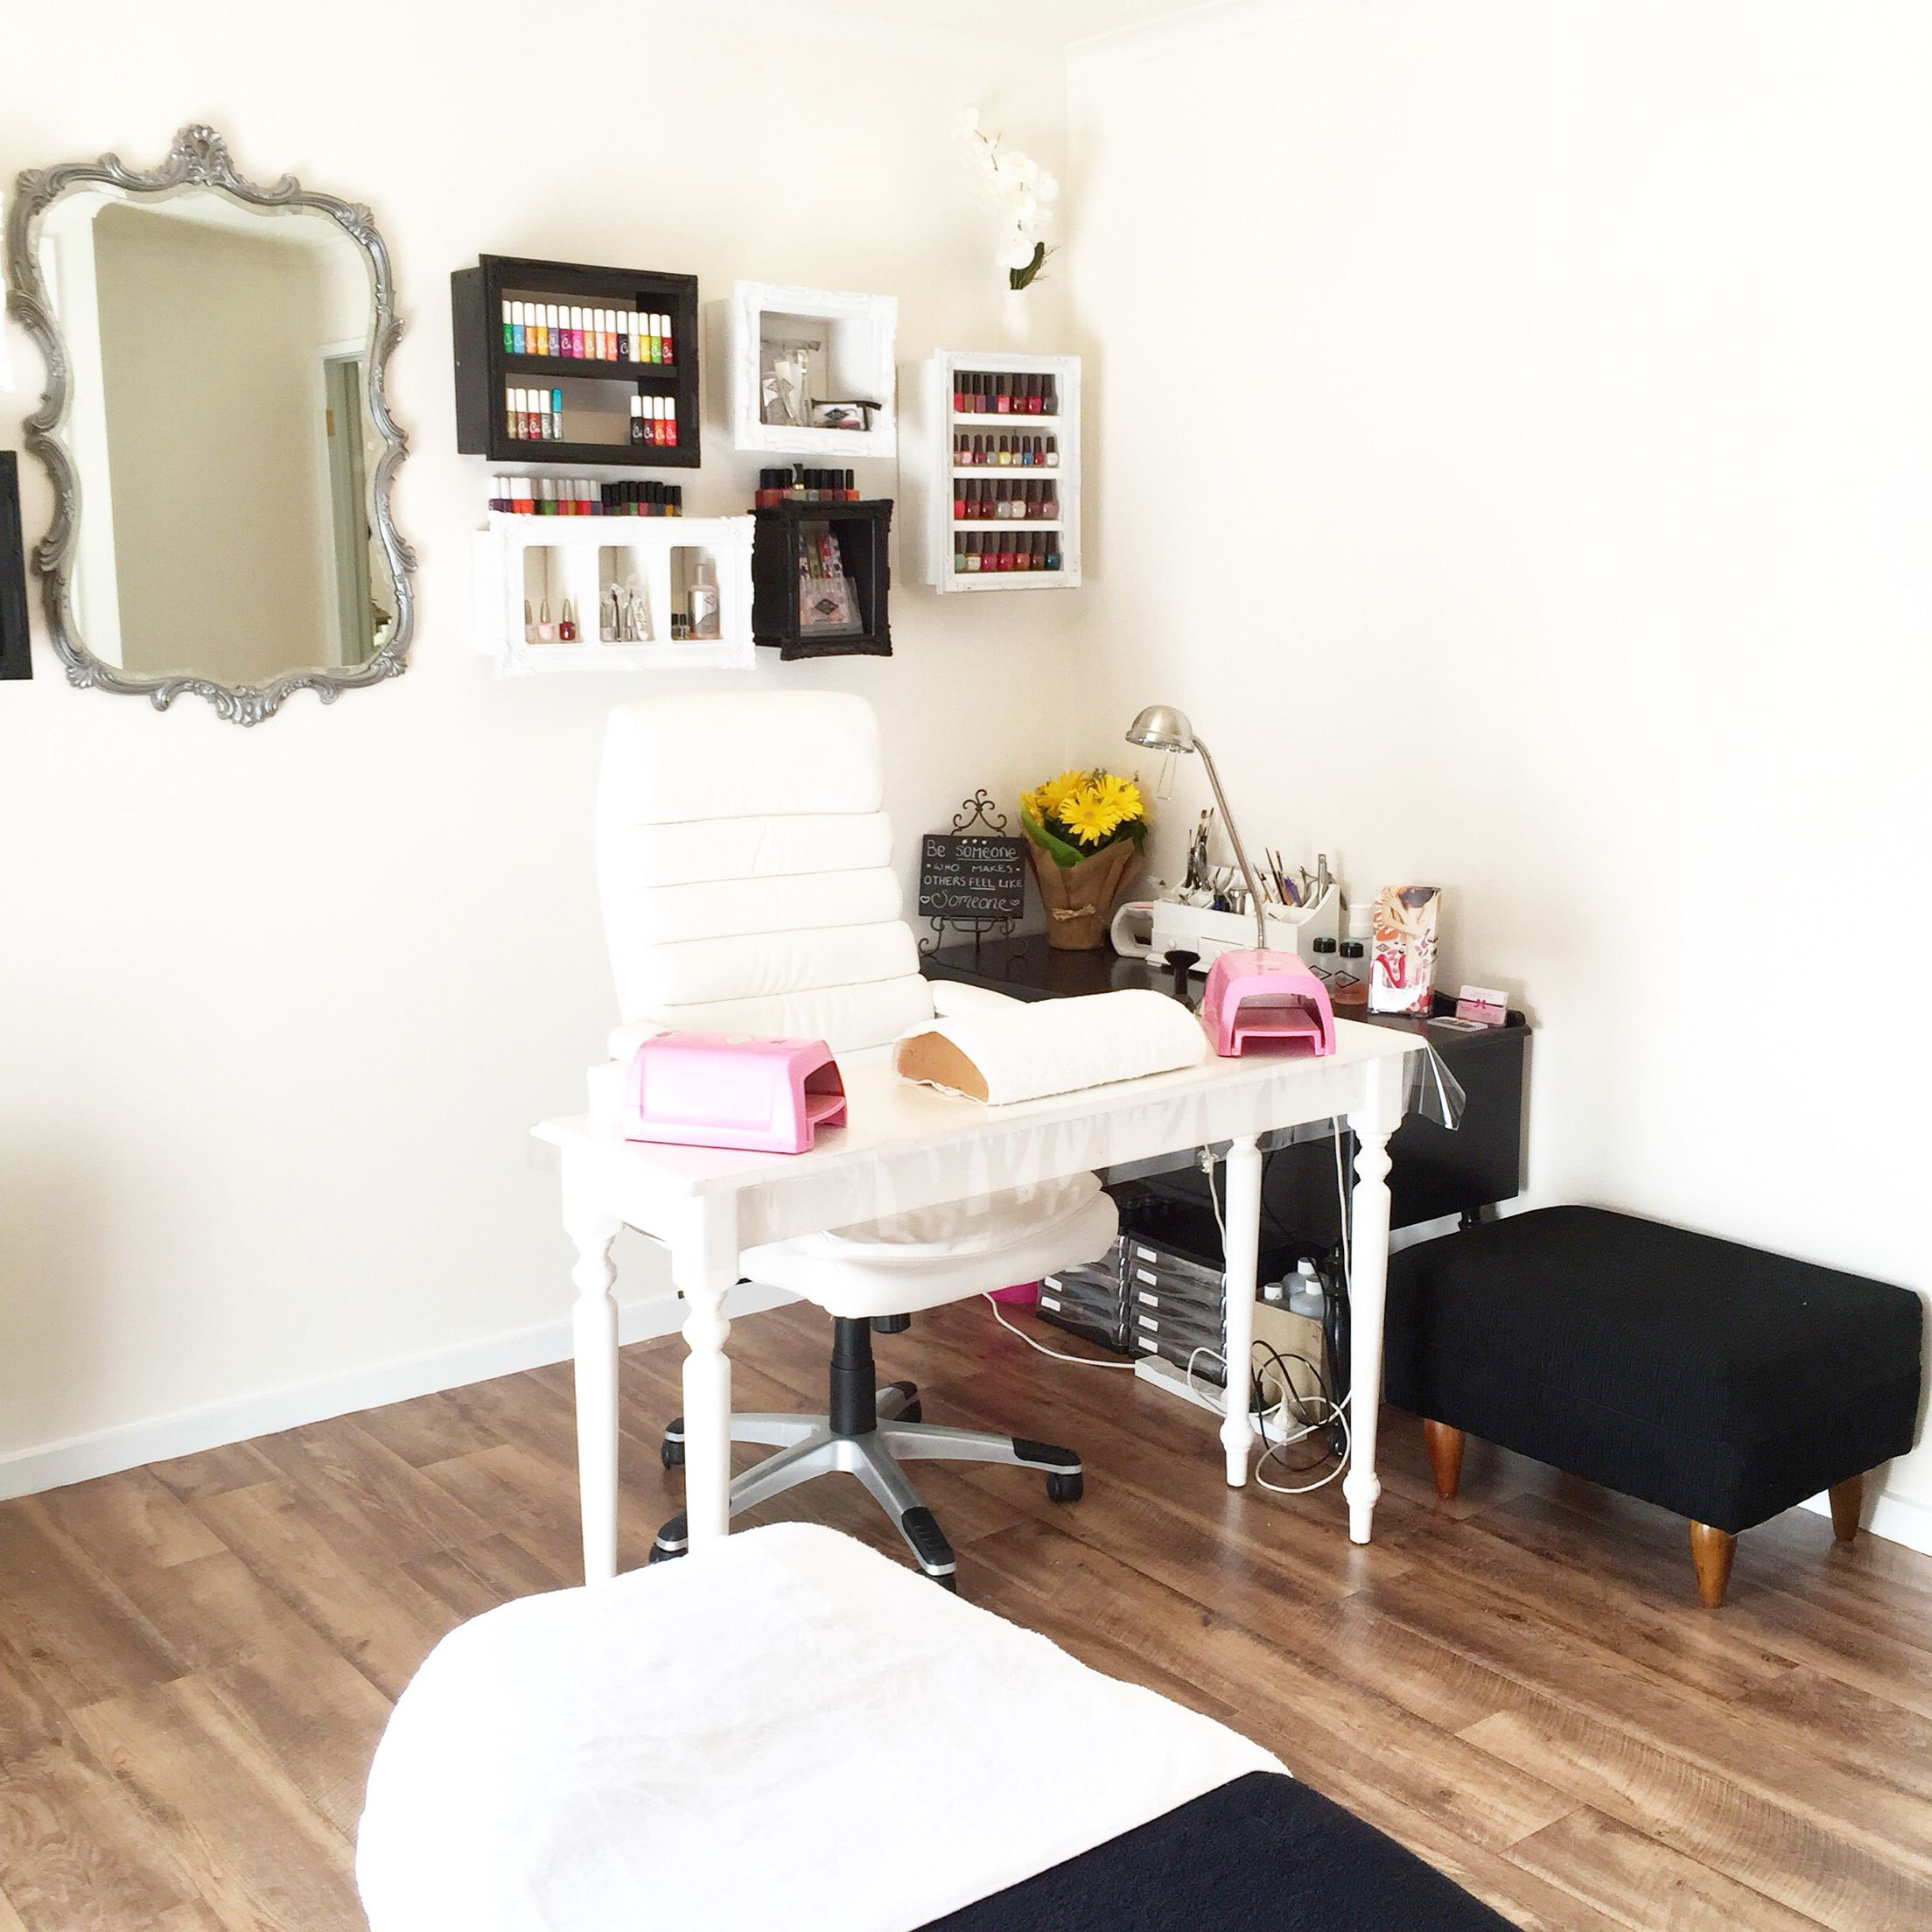 My home nail salon in Bendigo Australia. Www.colournepinkbendigo.com ...